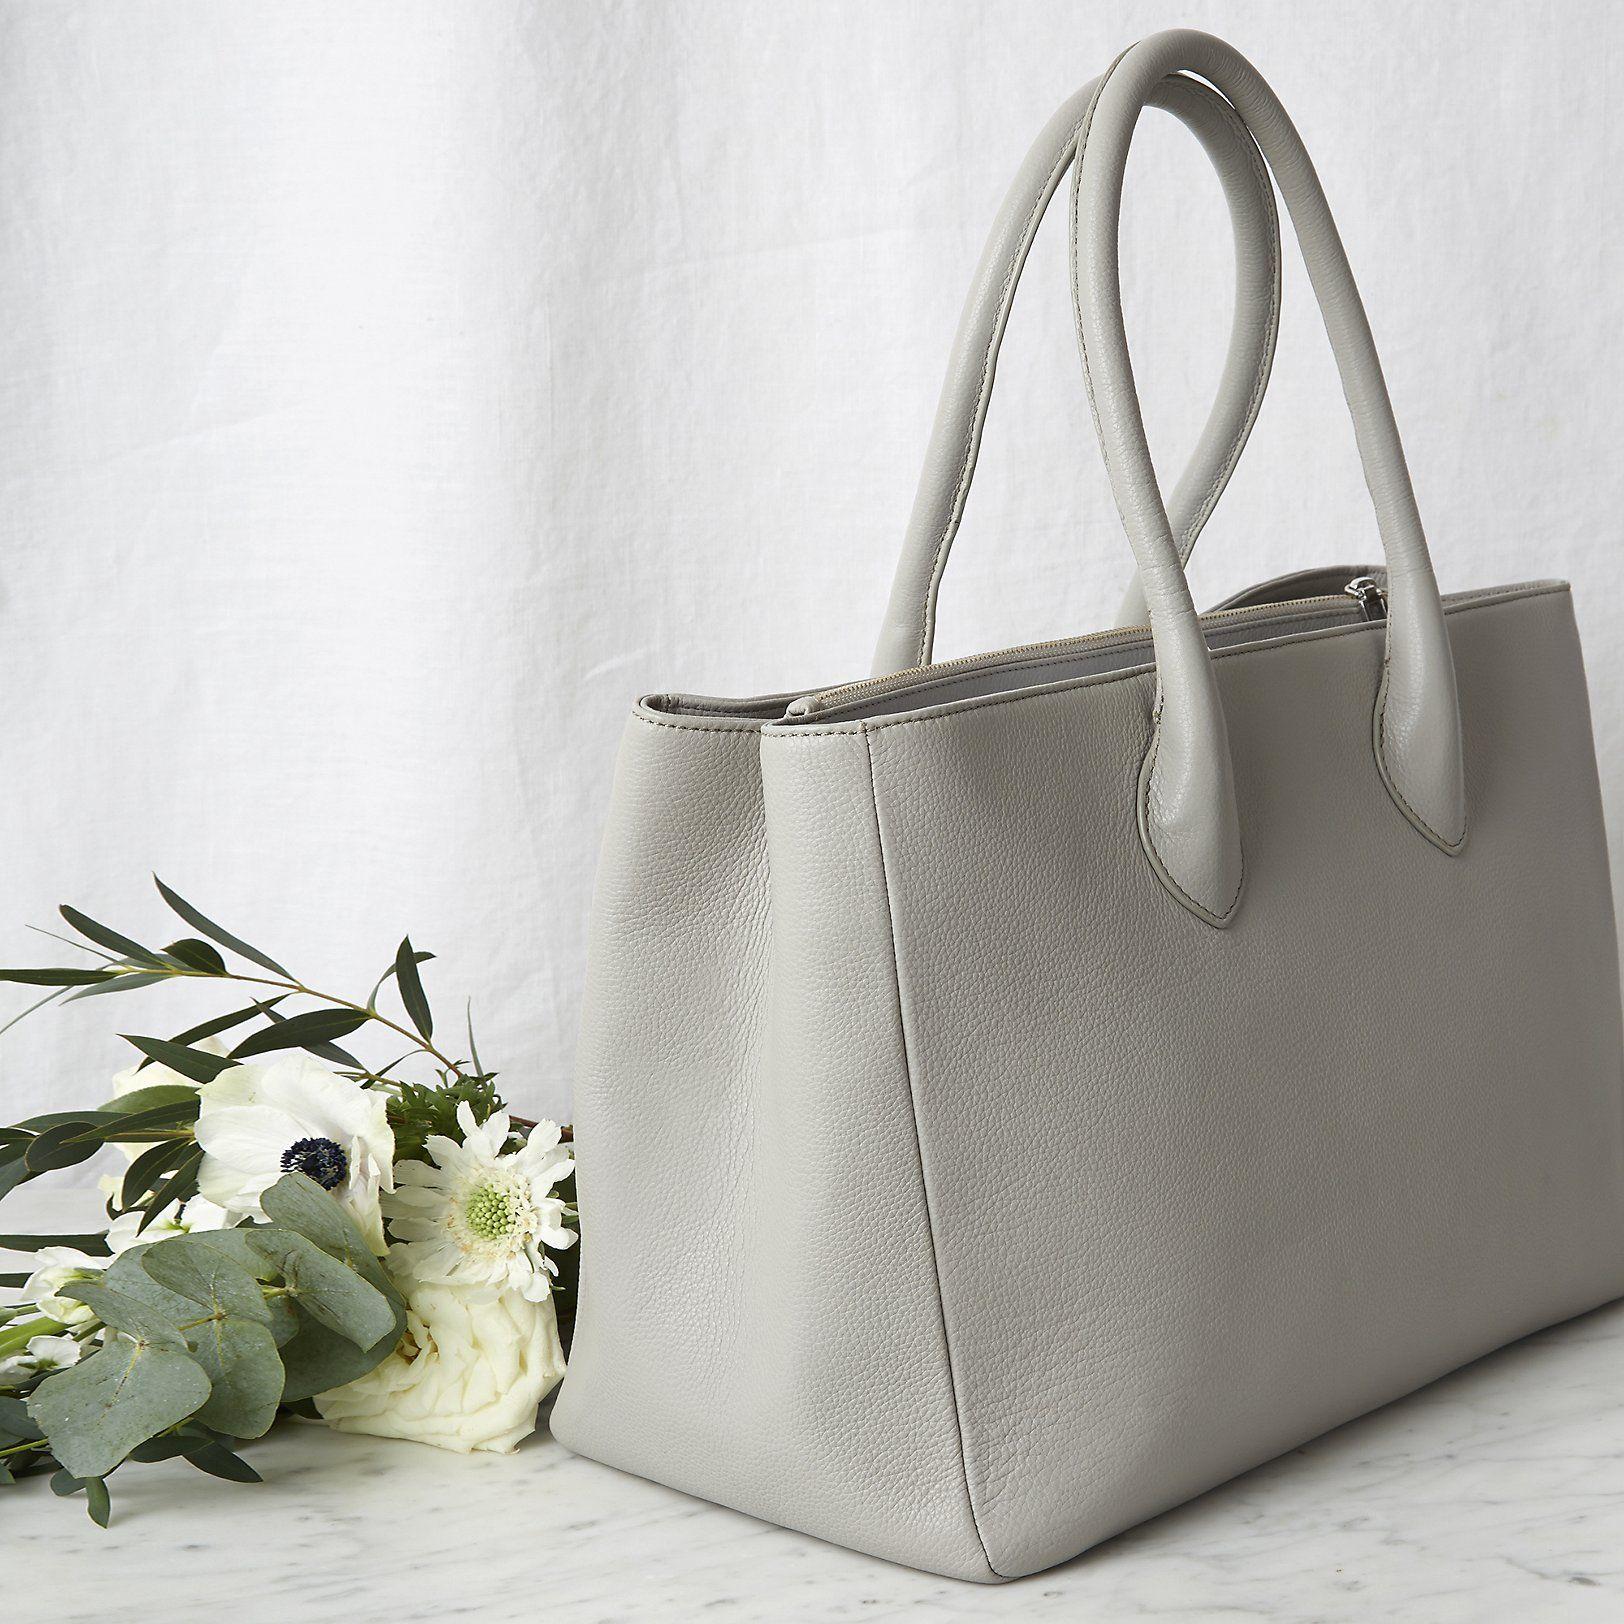 Silver leather tote bag uk - Bag